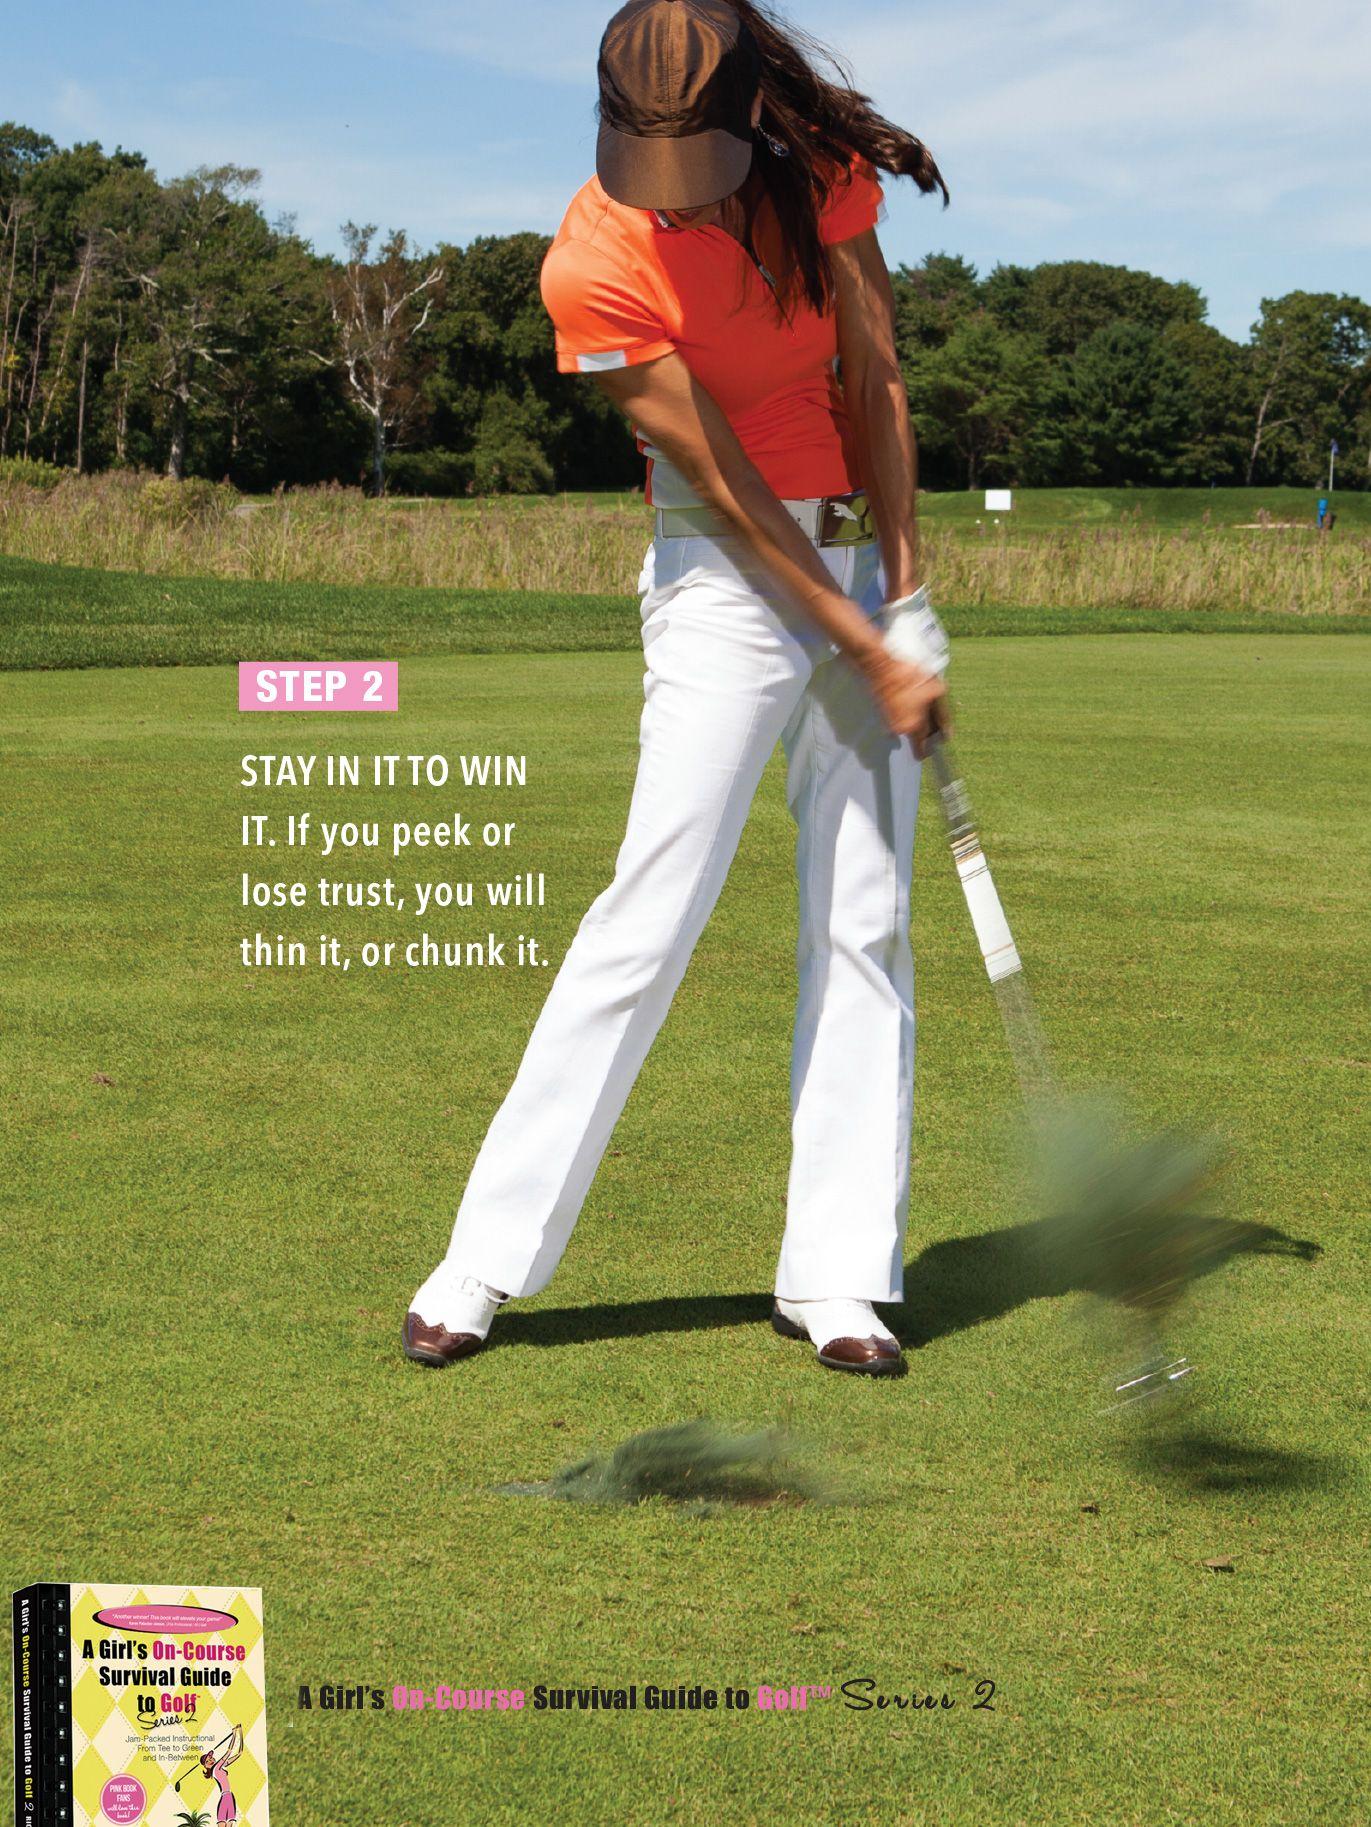 training swing trainer path pure sklz shop aids golf